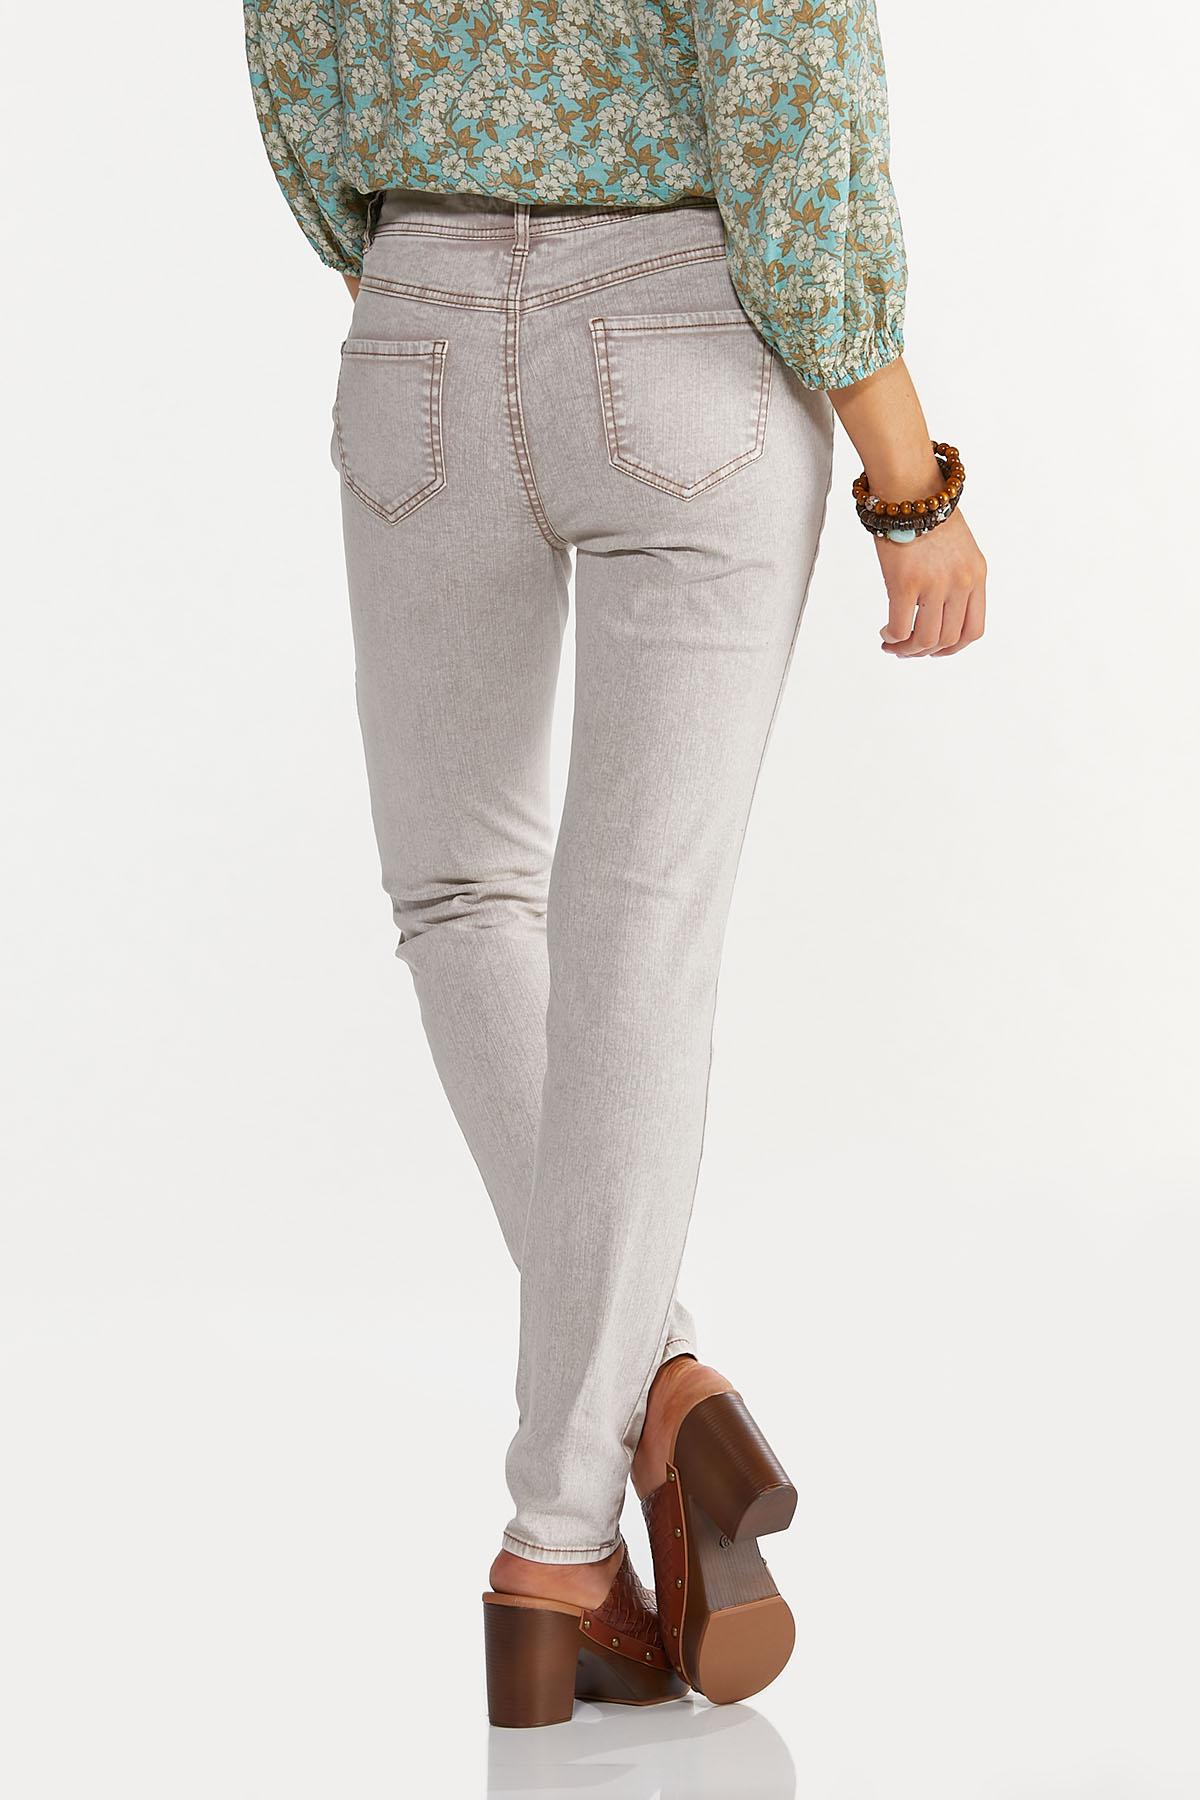 Beige High-Rise Skinny Jeans (Item #44638825)